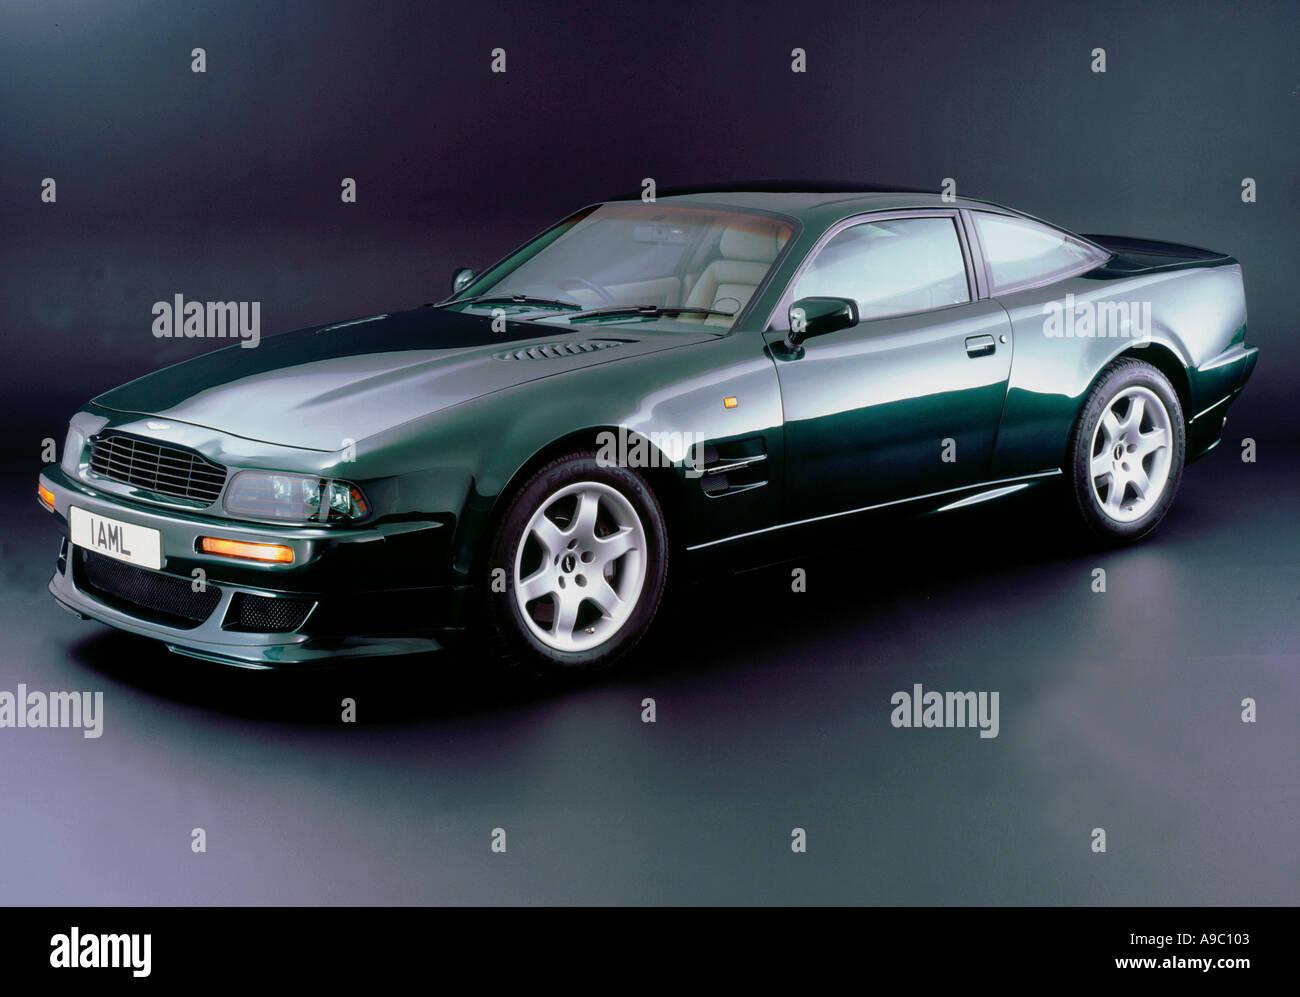 1994 Aston Martin V8 Vantage Stock Photo Alamy